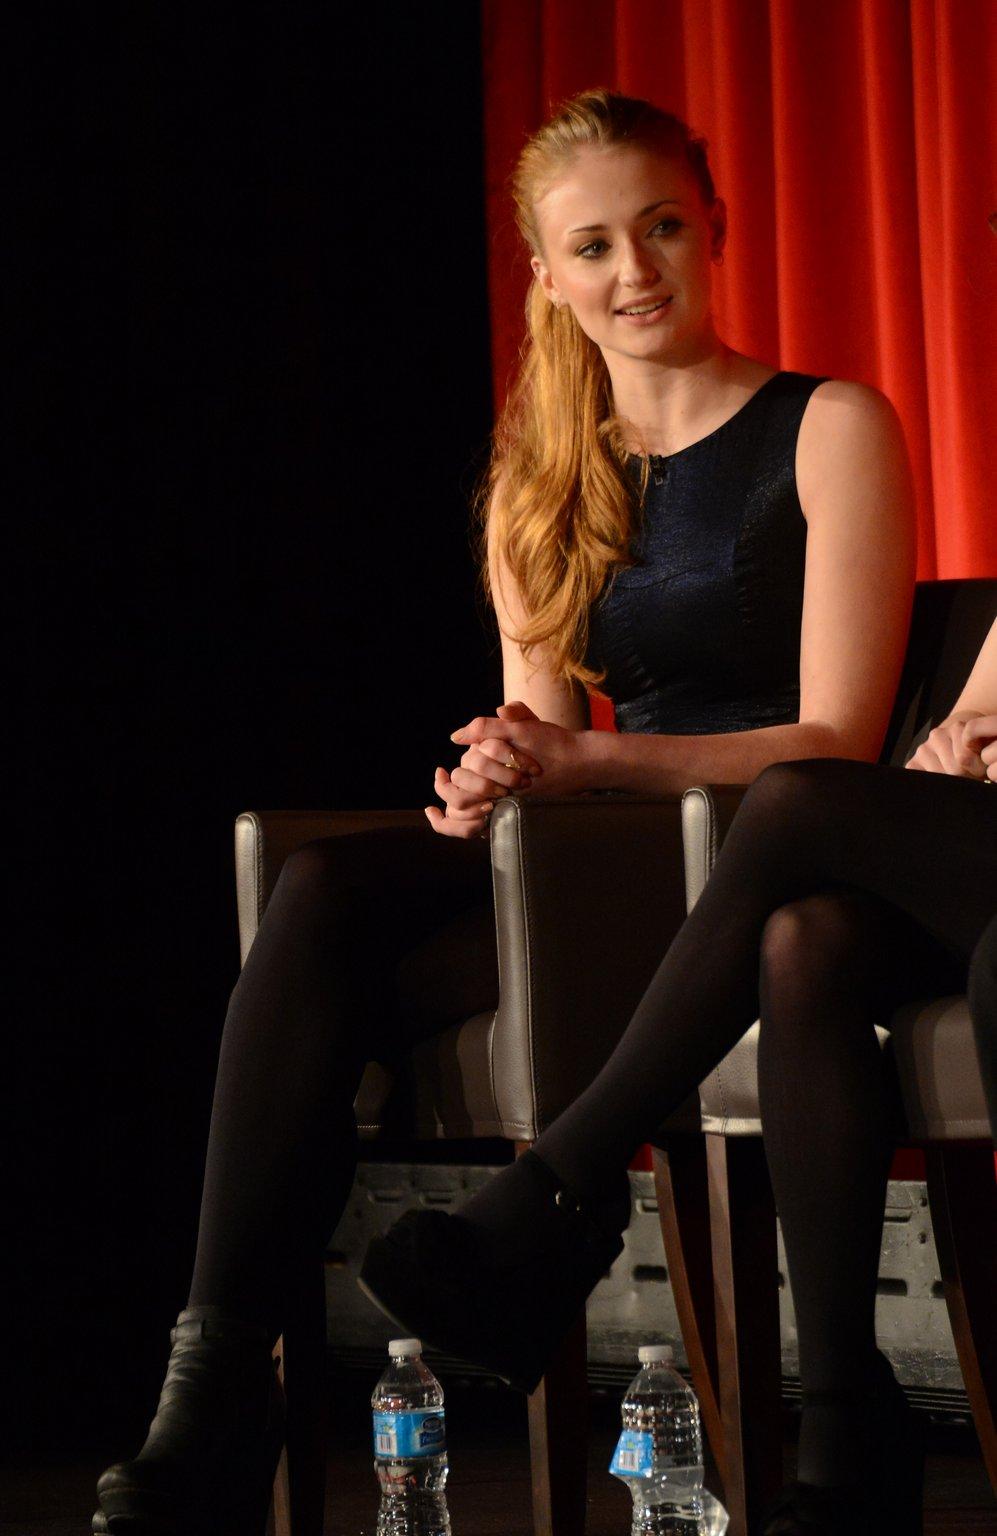 Pantyhose sophie turner Celebrity Legs